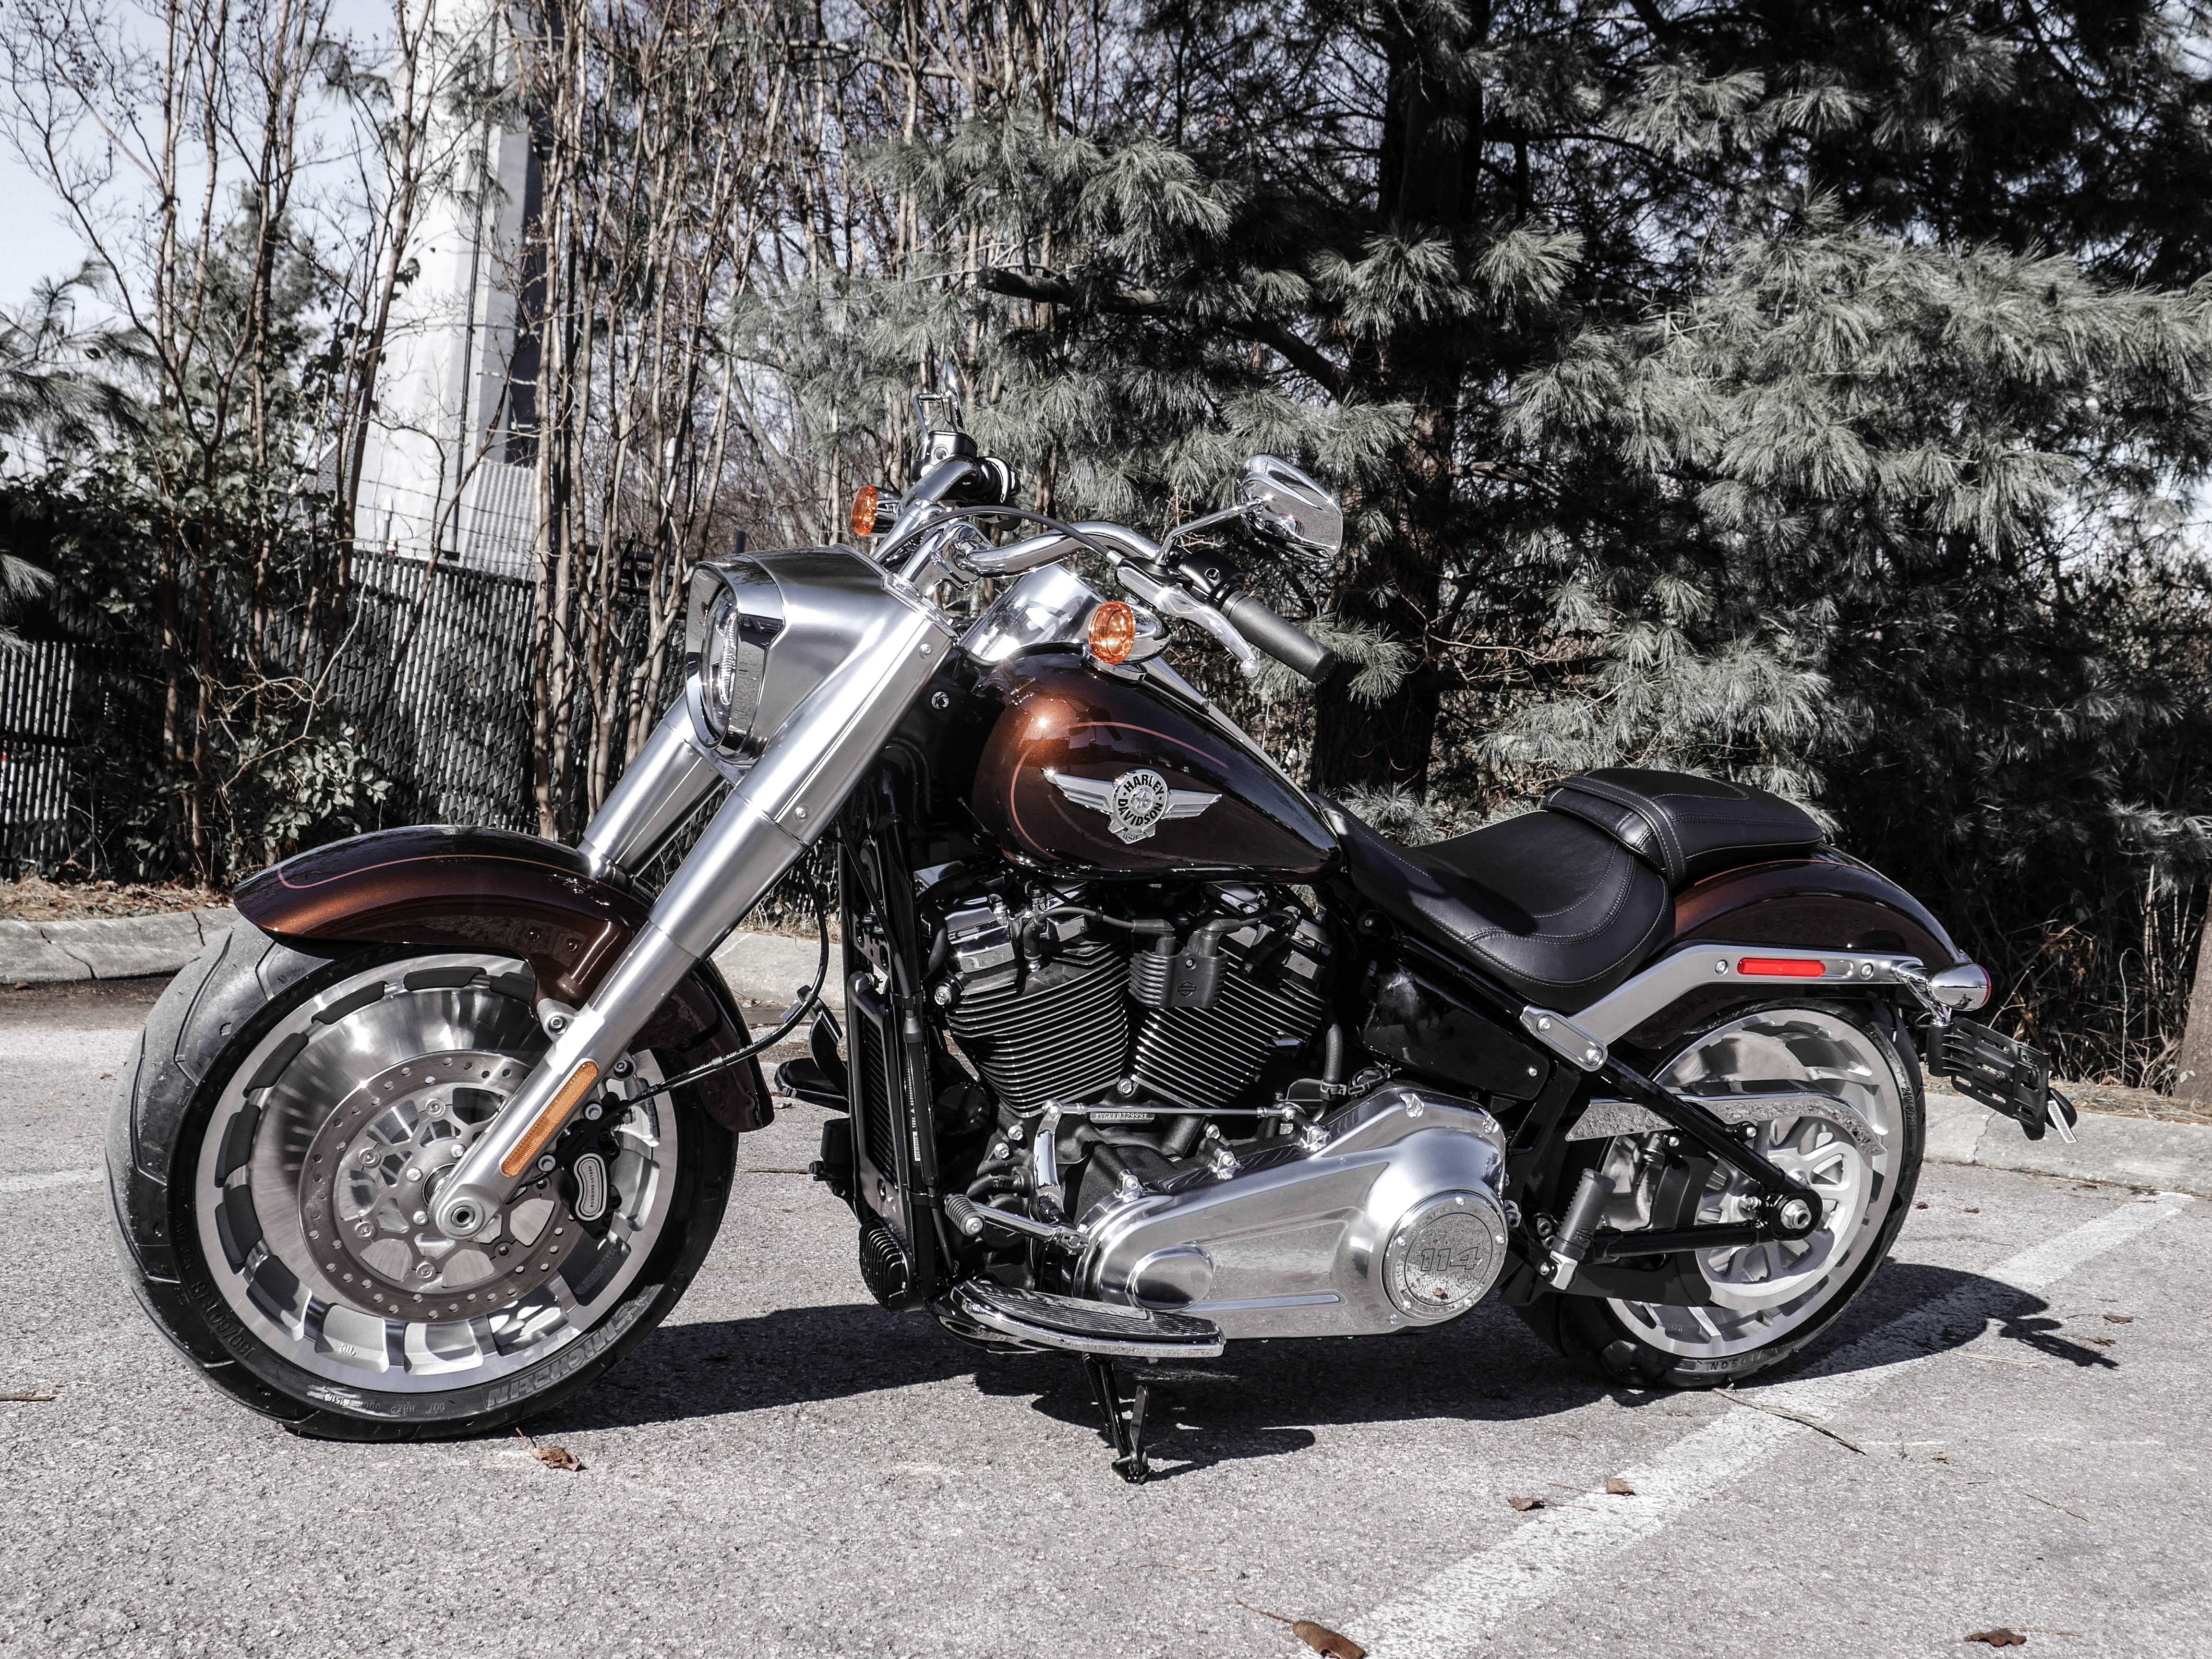 New 2019 Harley-Davidson Fat Boy 114 in Franklin #T032999